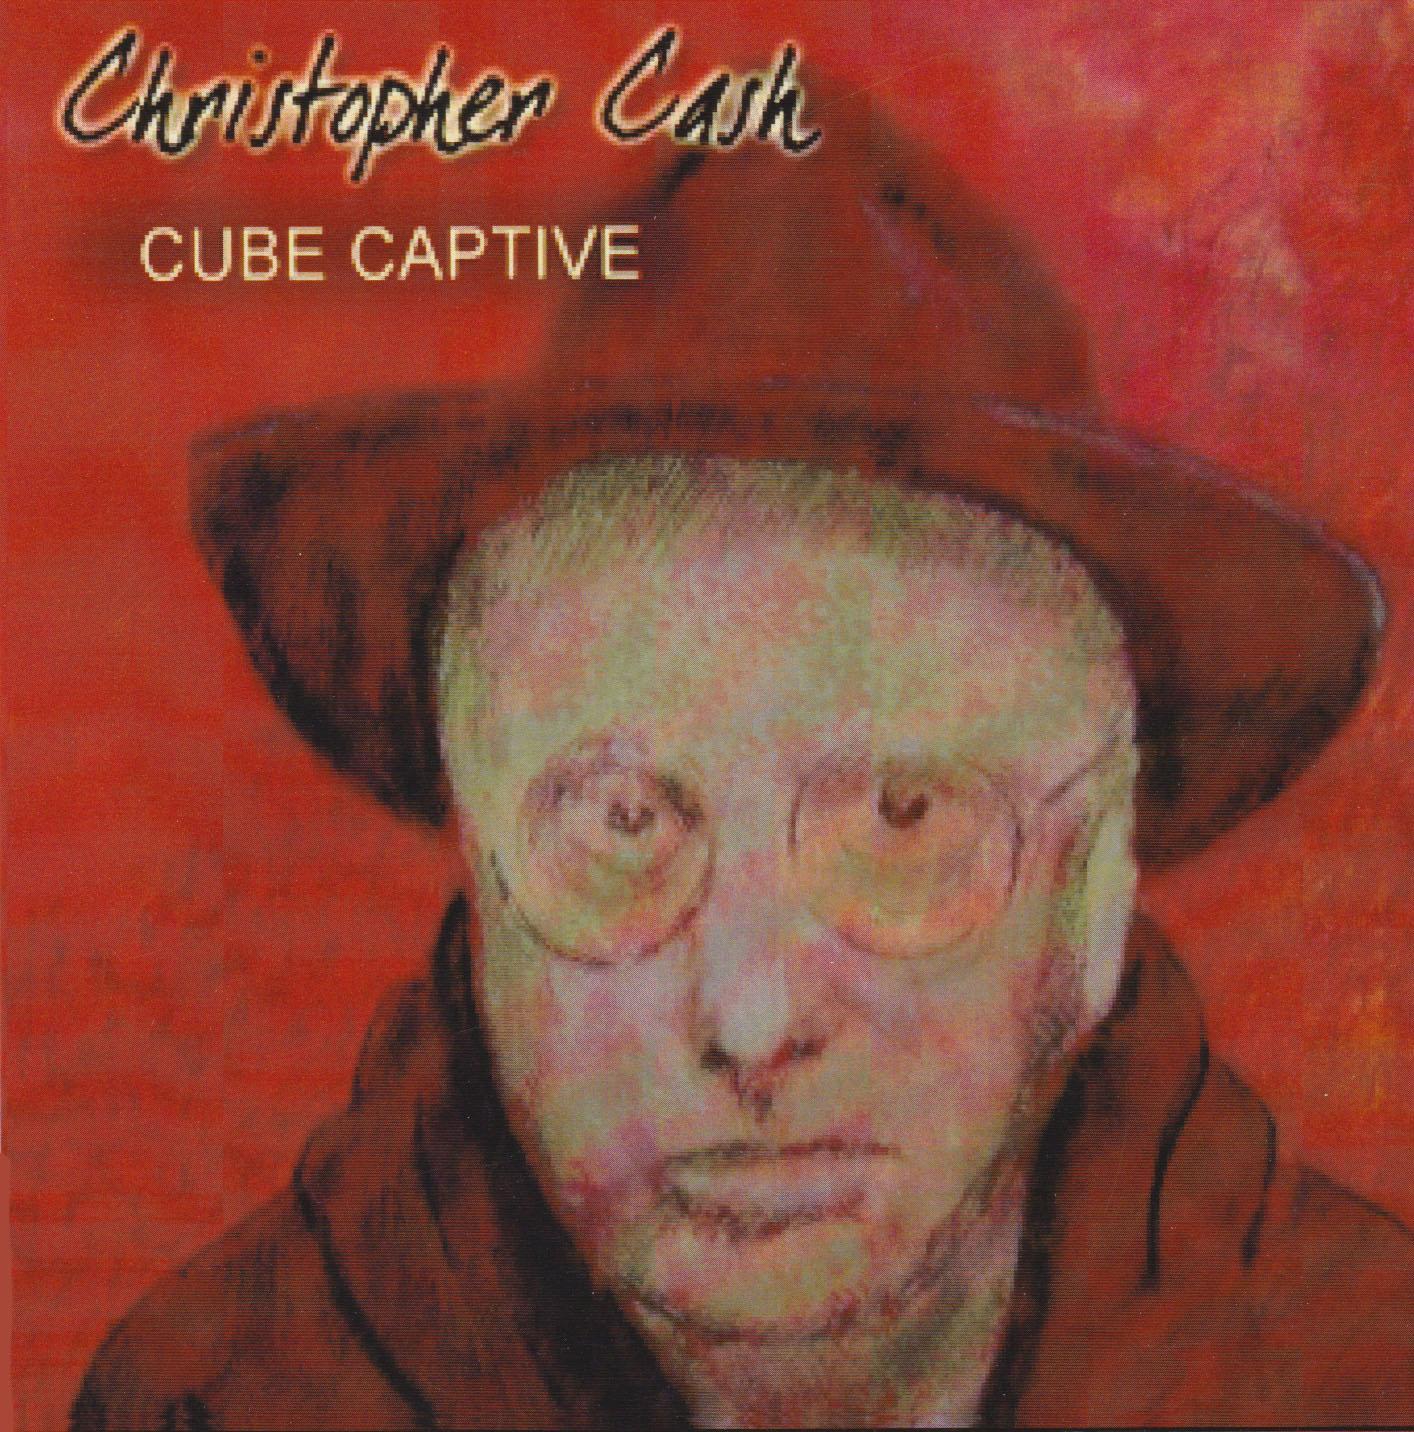 Cube Captive